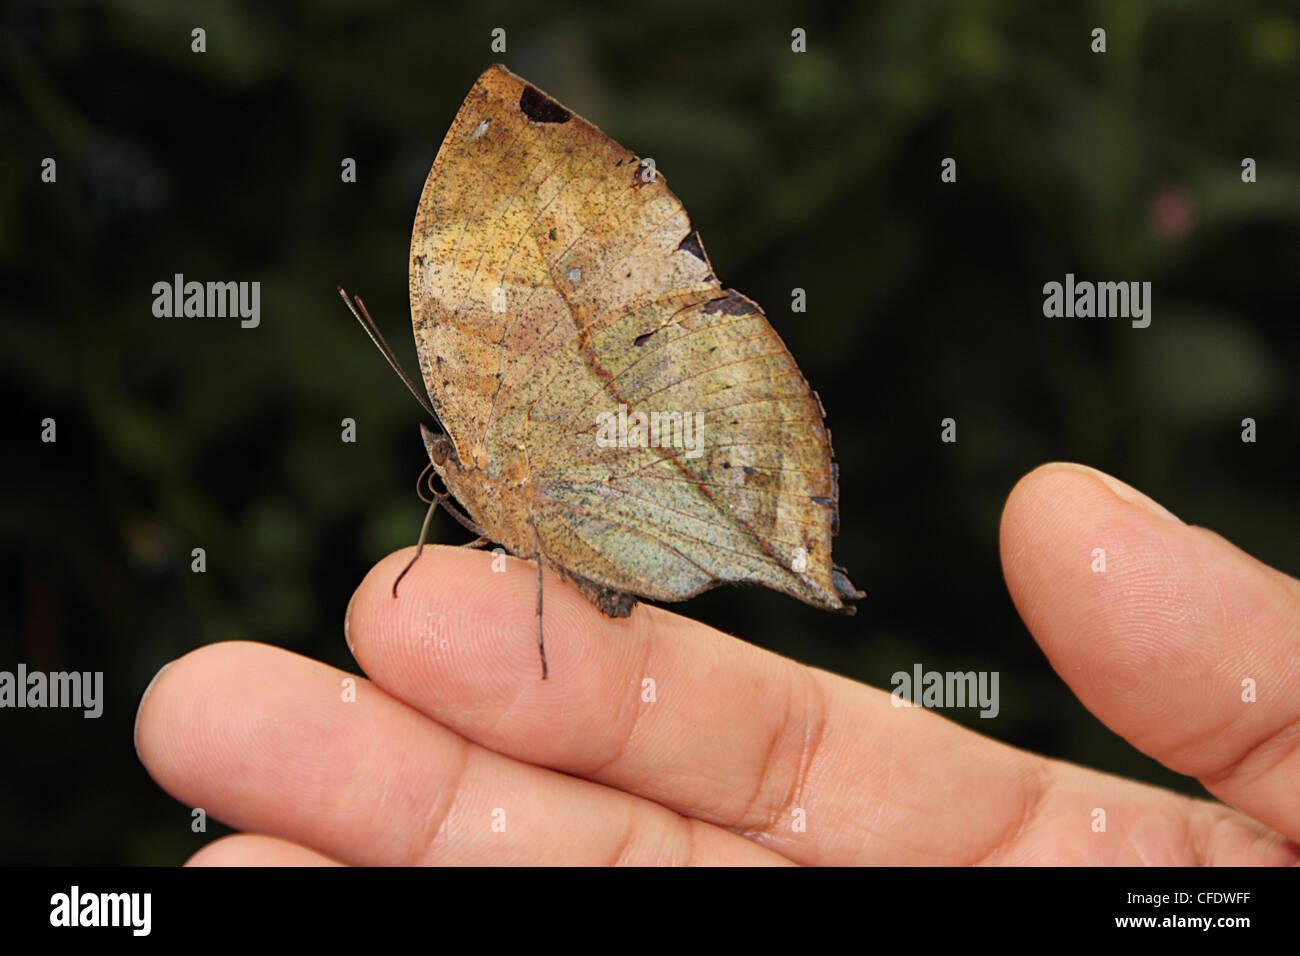 Foglia indiano Butterfly (Kallima paralekta) Immagini Stock